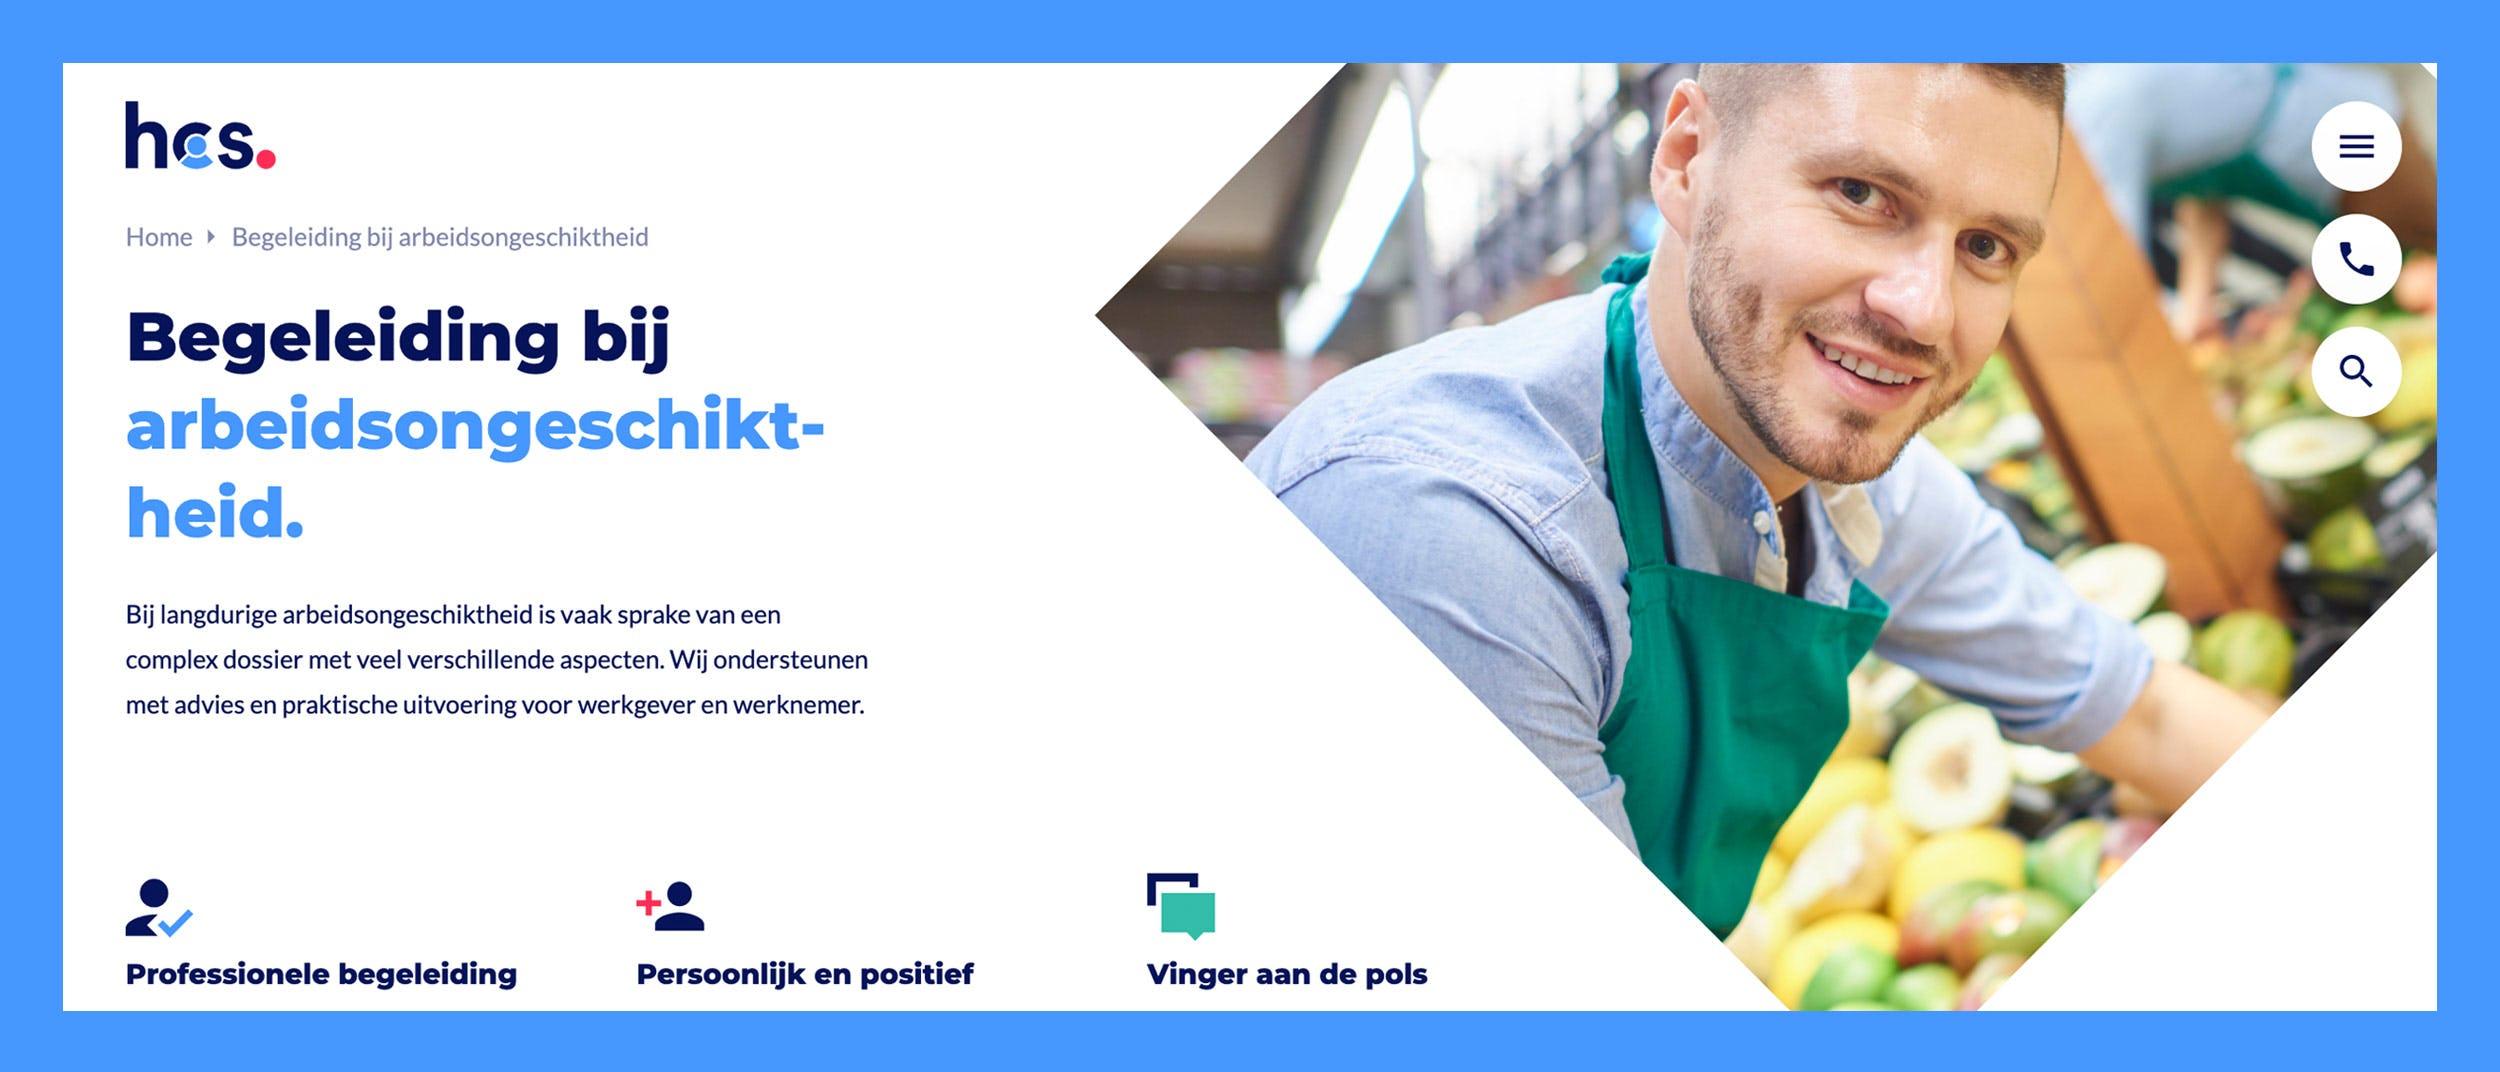 Nationale-Nederlanden Insurance: Chunk Creative Agency - Amsterdam | London